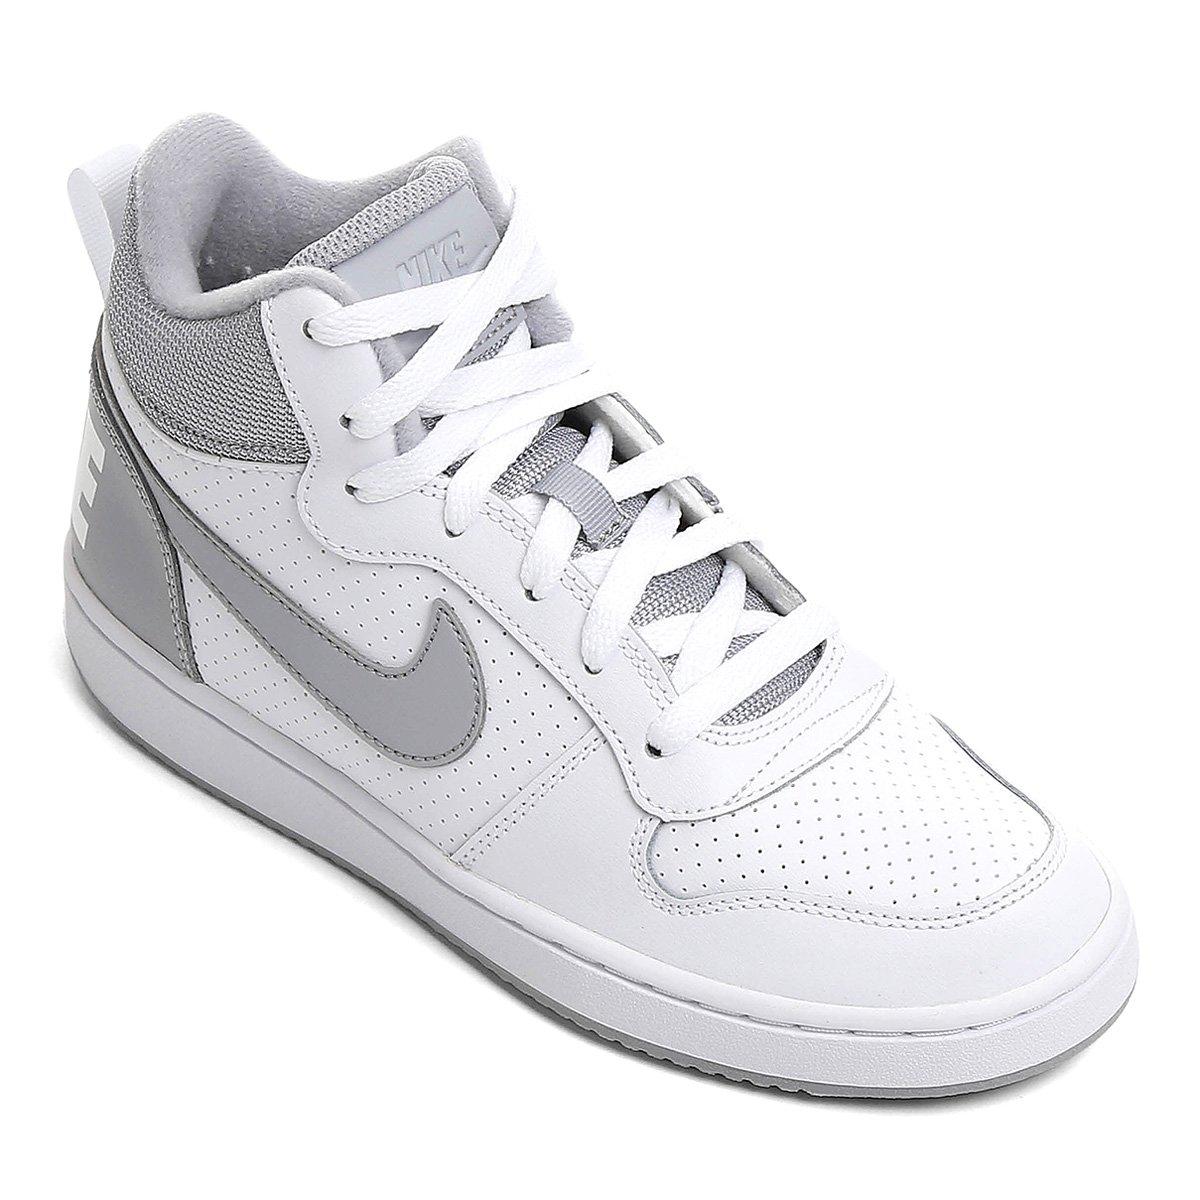 025349469e5 Tênis Infantil Nike Court Borough Mid Masculino - Branco e Cinza - Compre  Agora